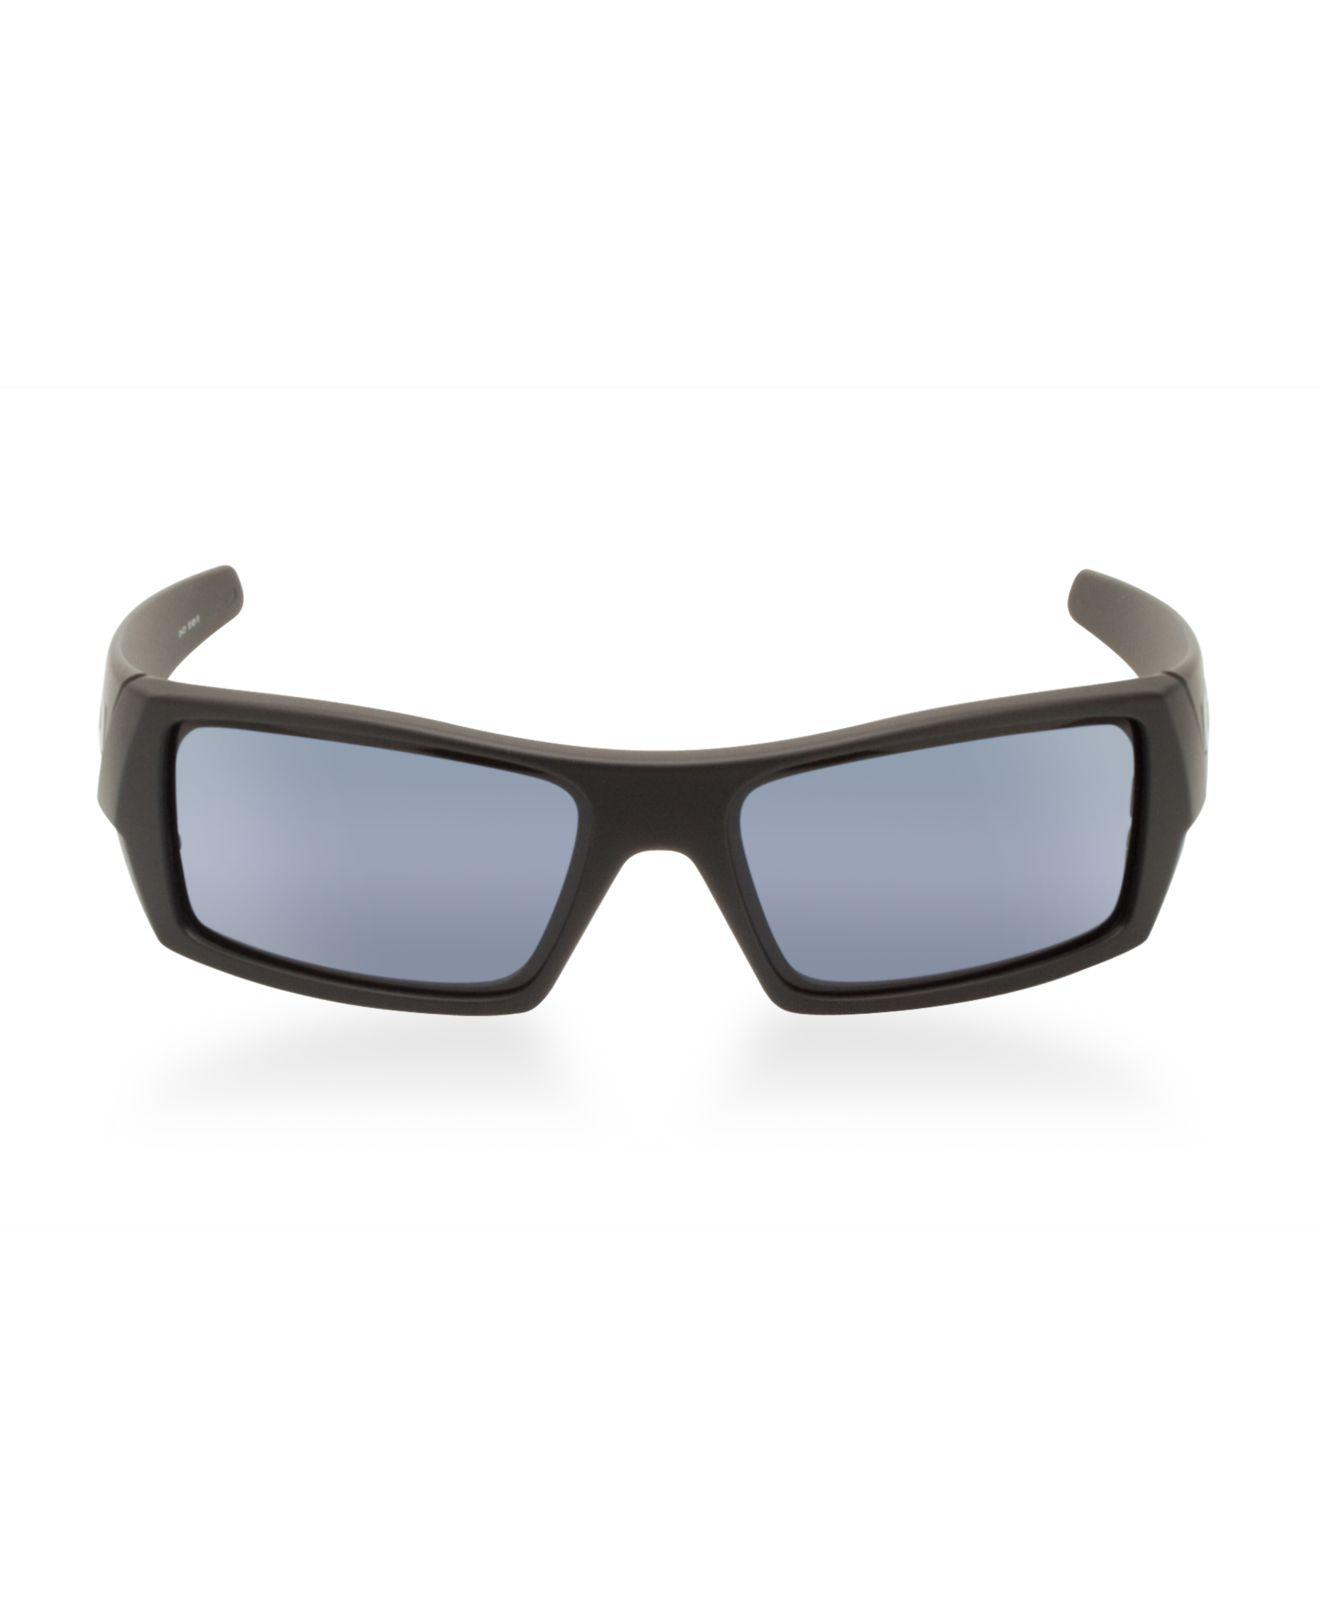 ffa6137160 Lyst - Oakley Sunglasses